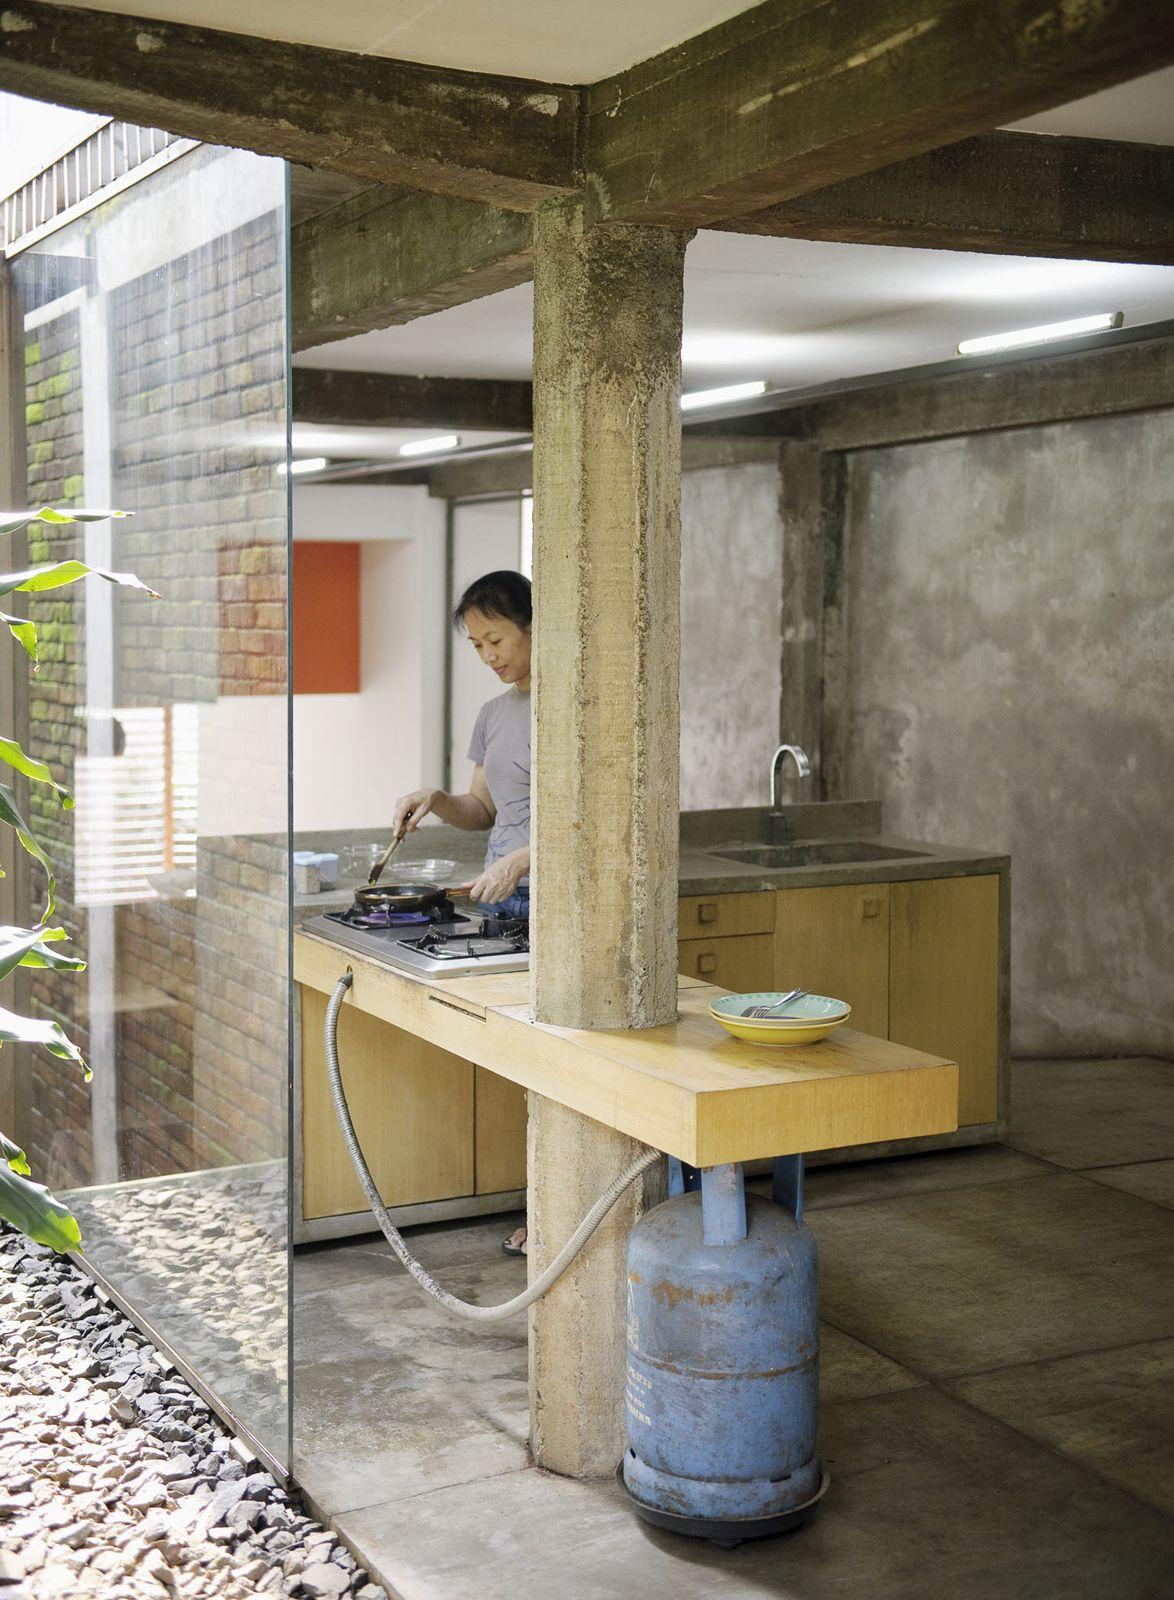 Slideshow Jakarta, Indonesia Dwell Dapur cantik, Ide